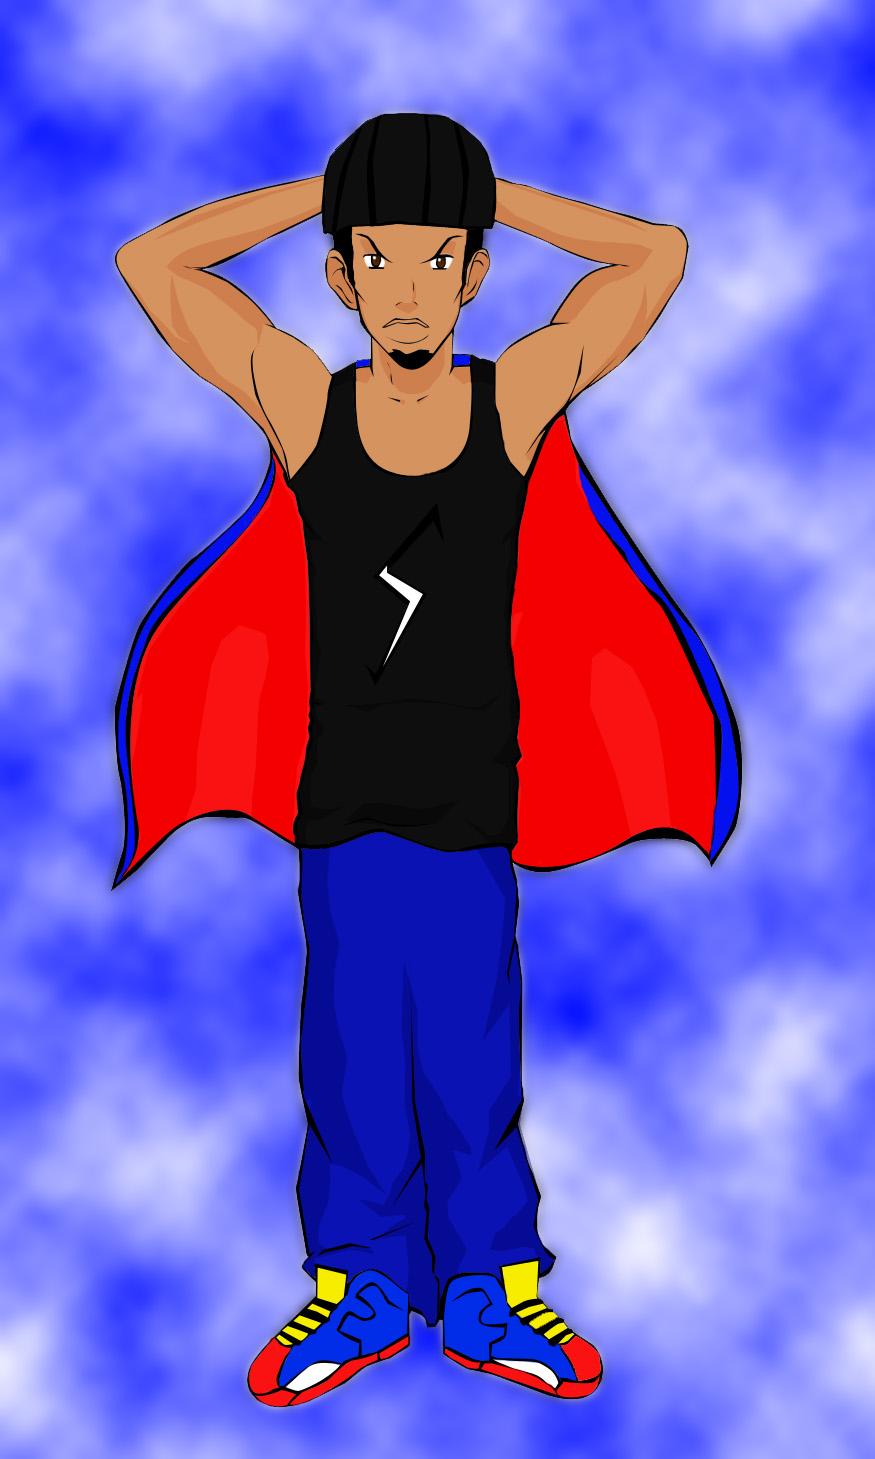 gangsta superman on july 4th 2 by yerxeo on deviantart